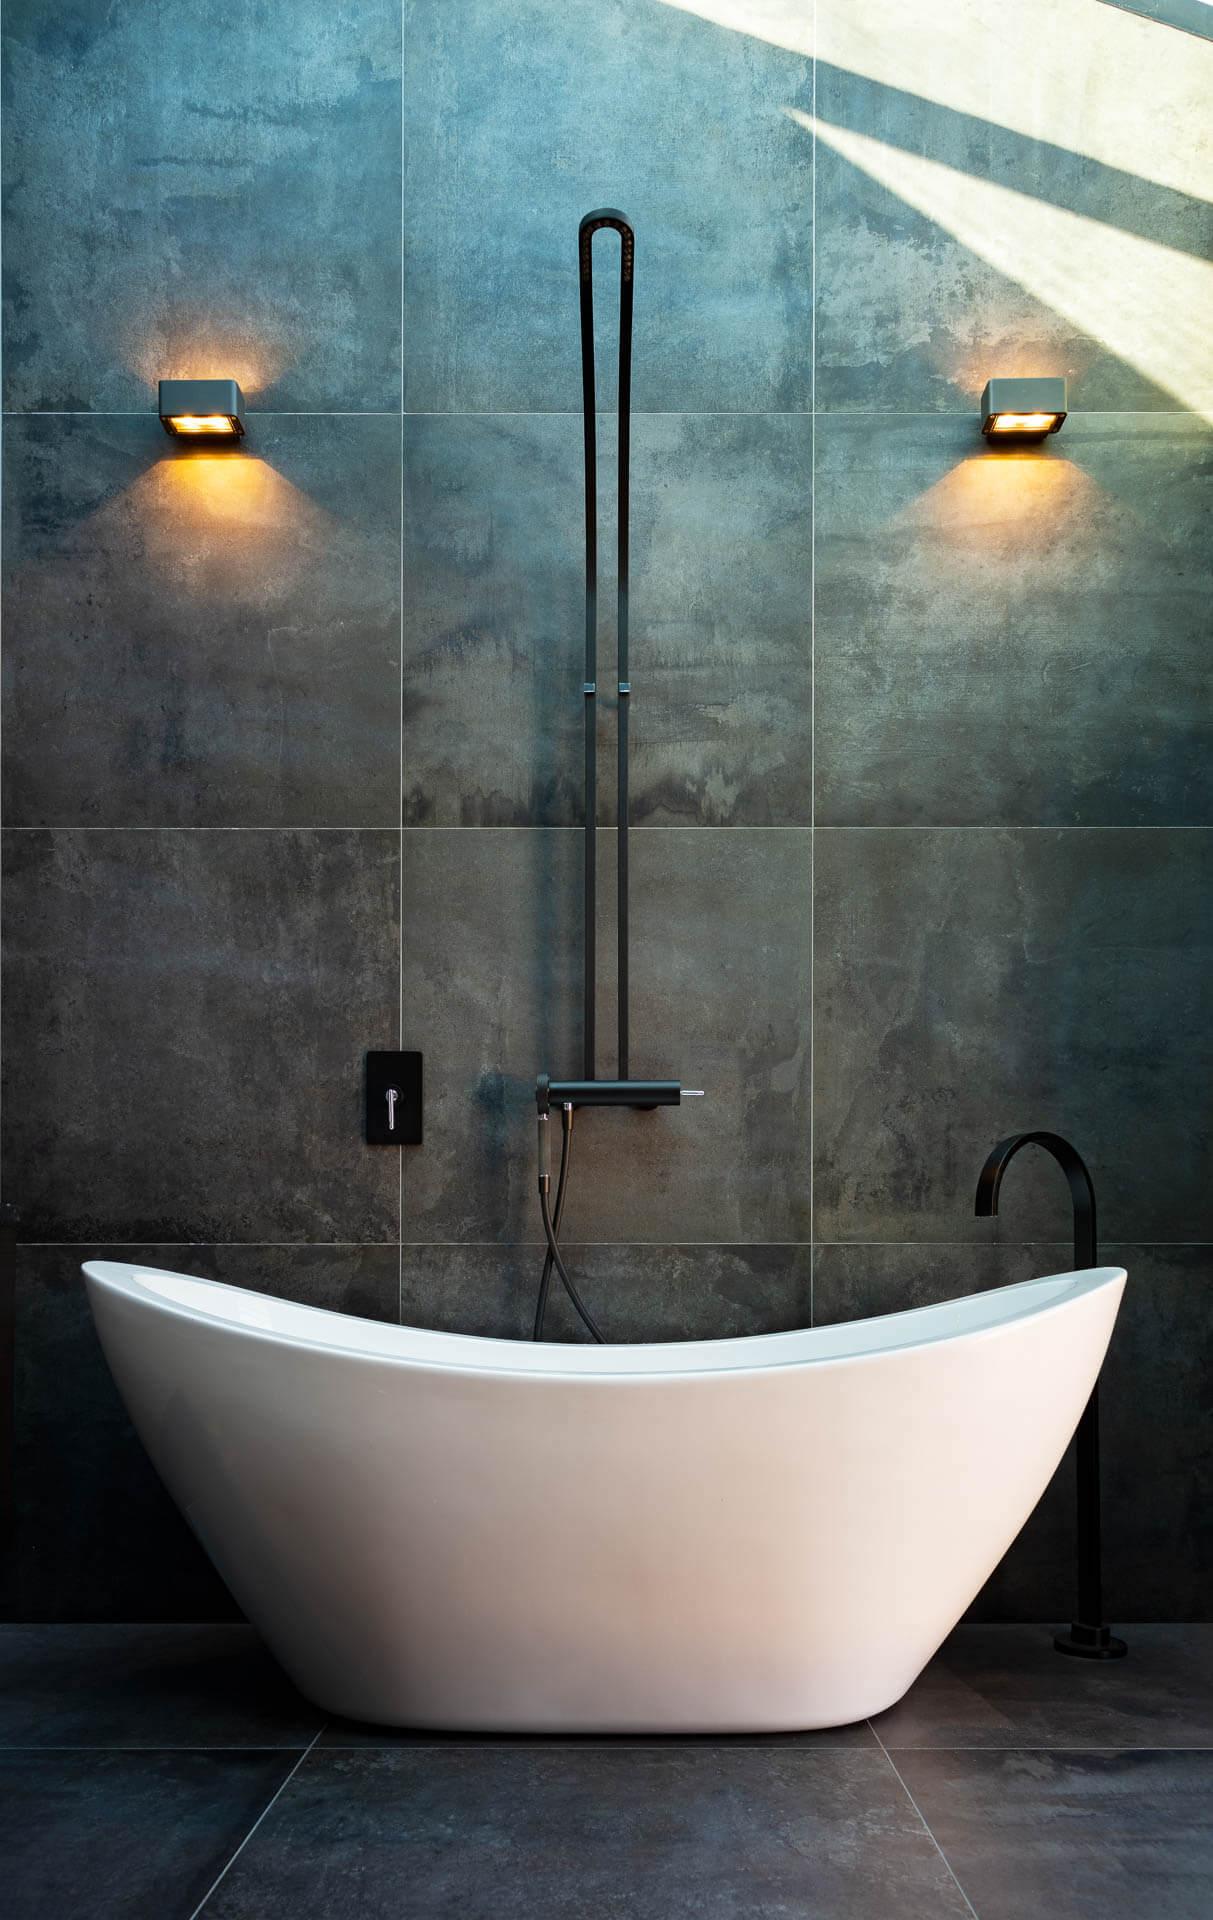 bath-_OWP9662-HDR.jpg